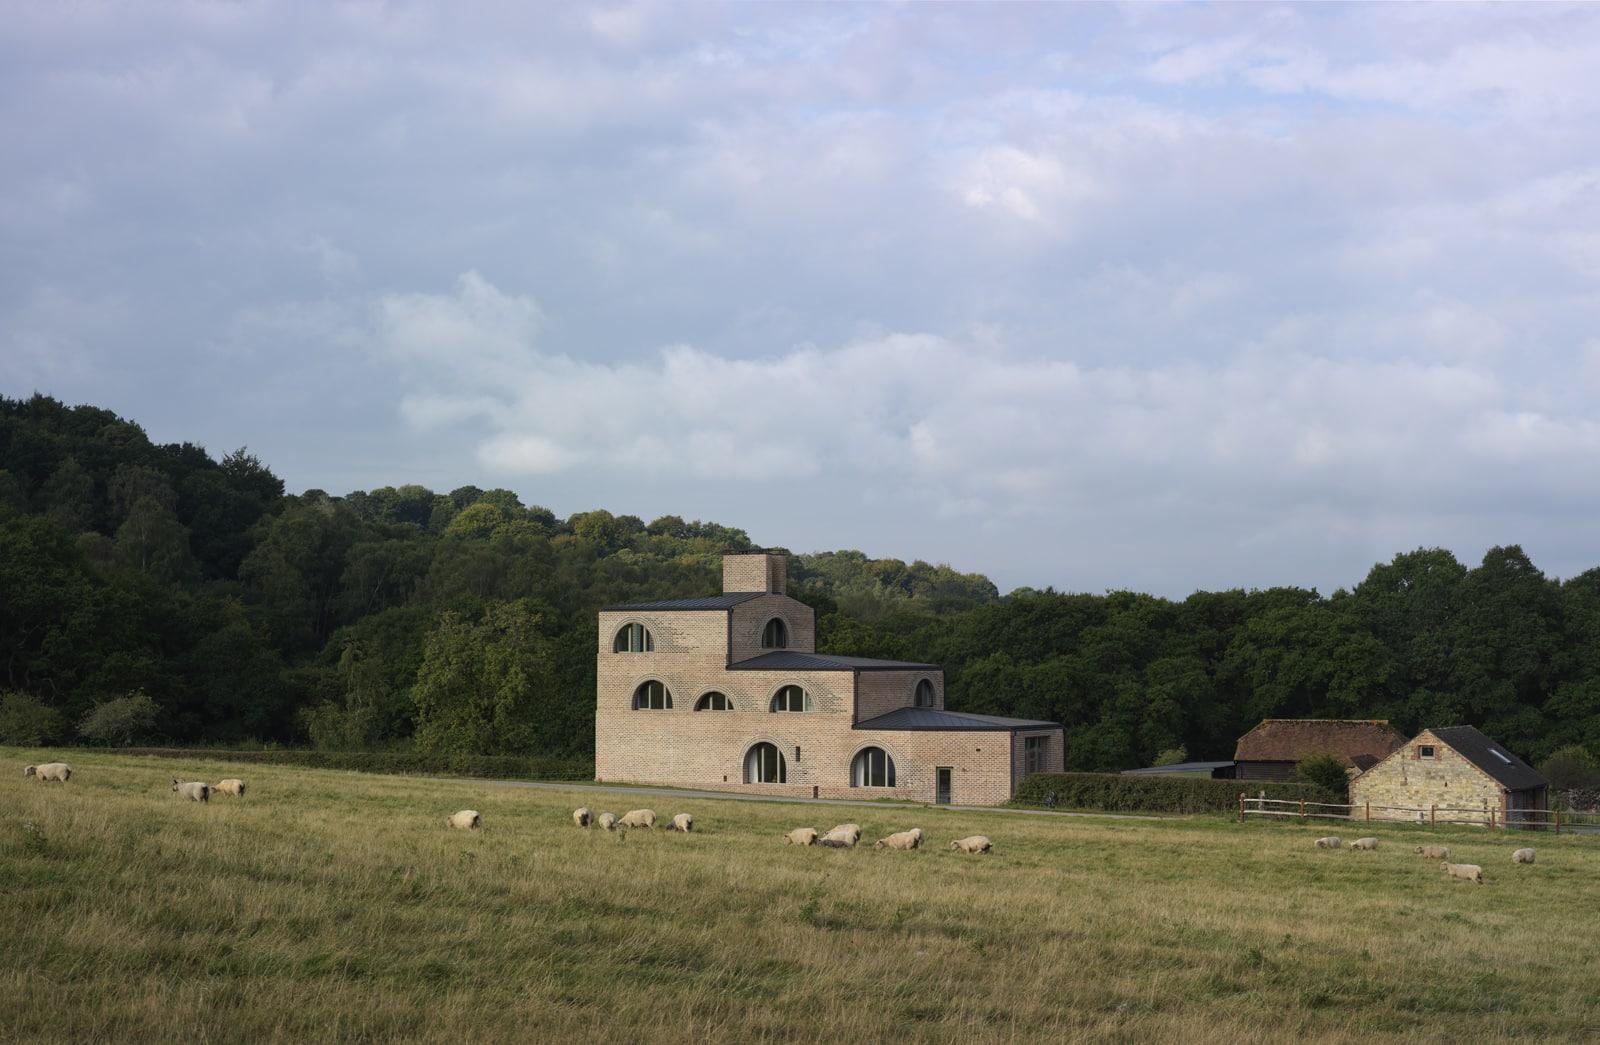 Nithurst Farm  - 20210802 ARA NithurstFarm 00 32